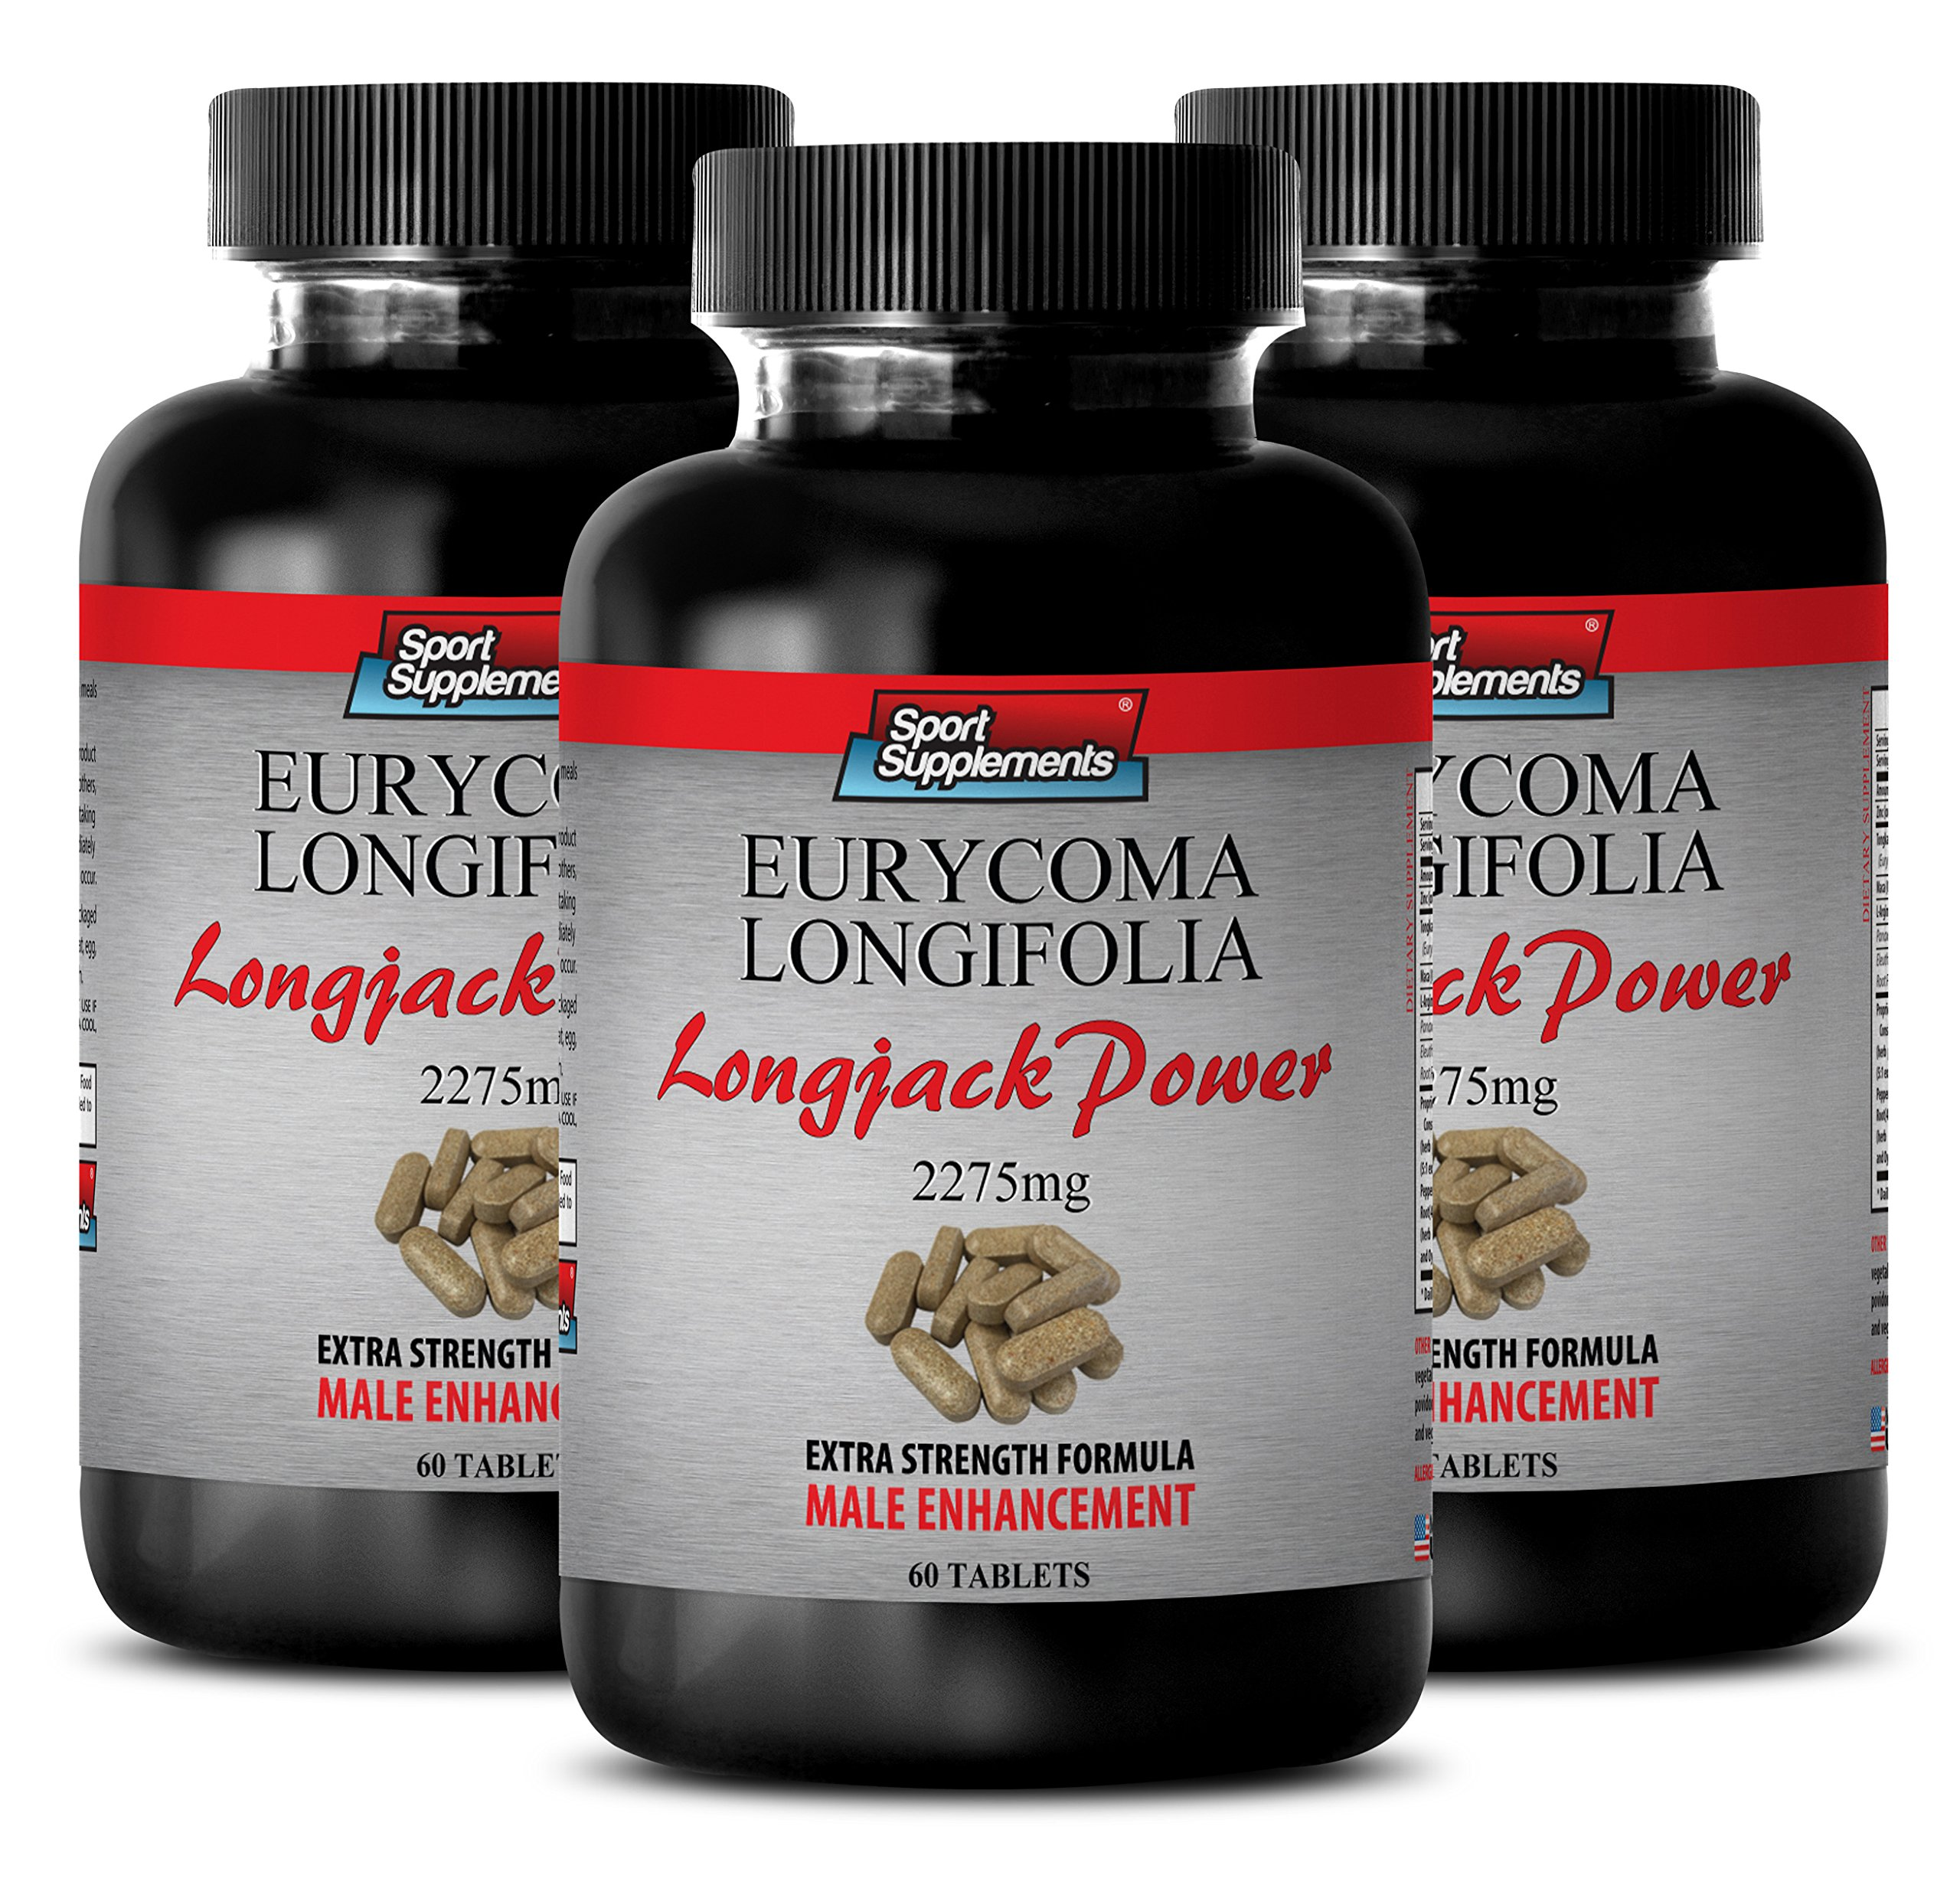 l-arginine - Longjack Power Eurycoma Longifolia 2275mg - Sexual enhancer for men pills (3 Bottles - 180 Tablets)